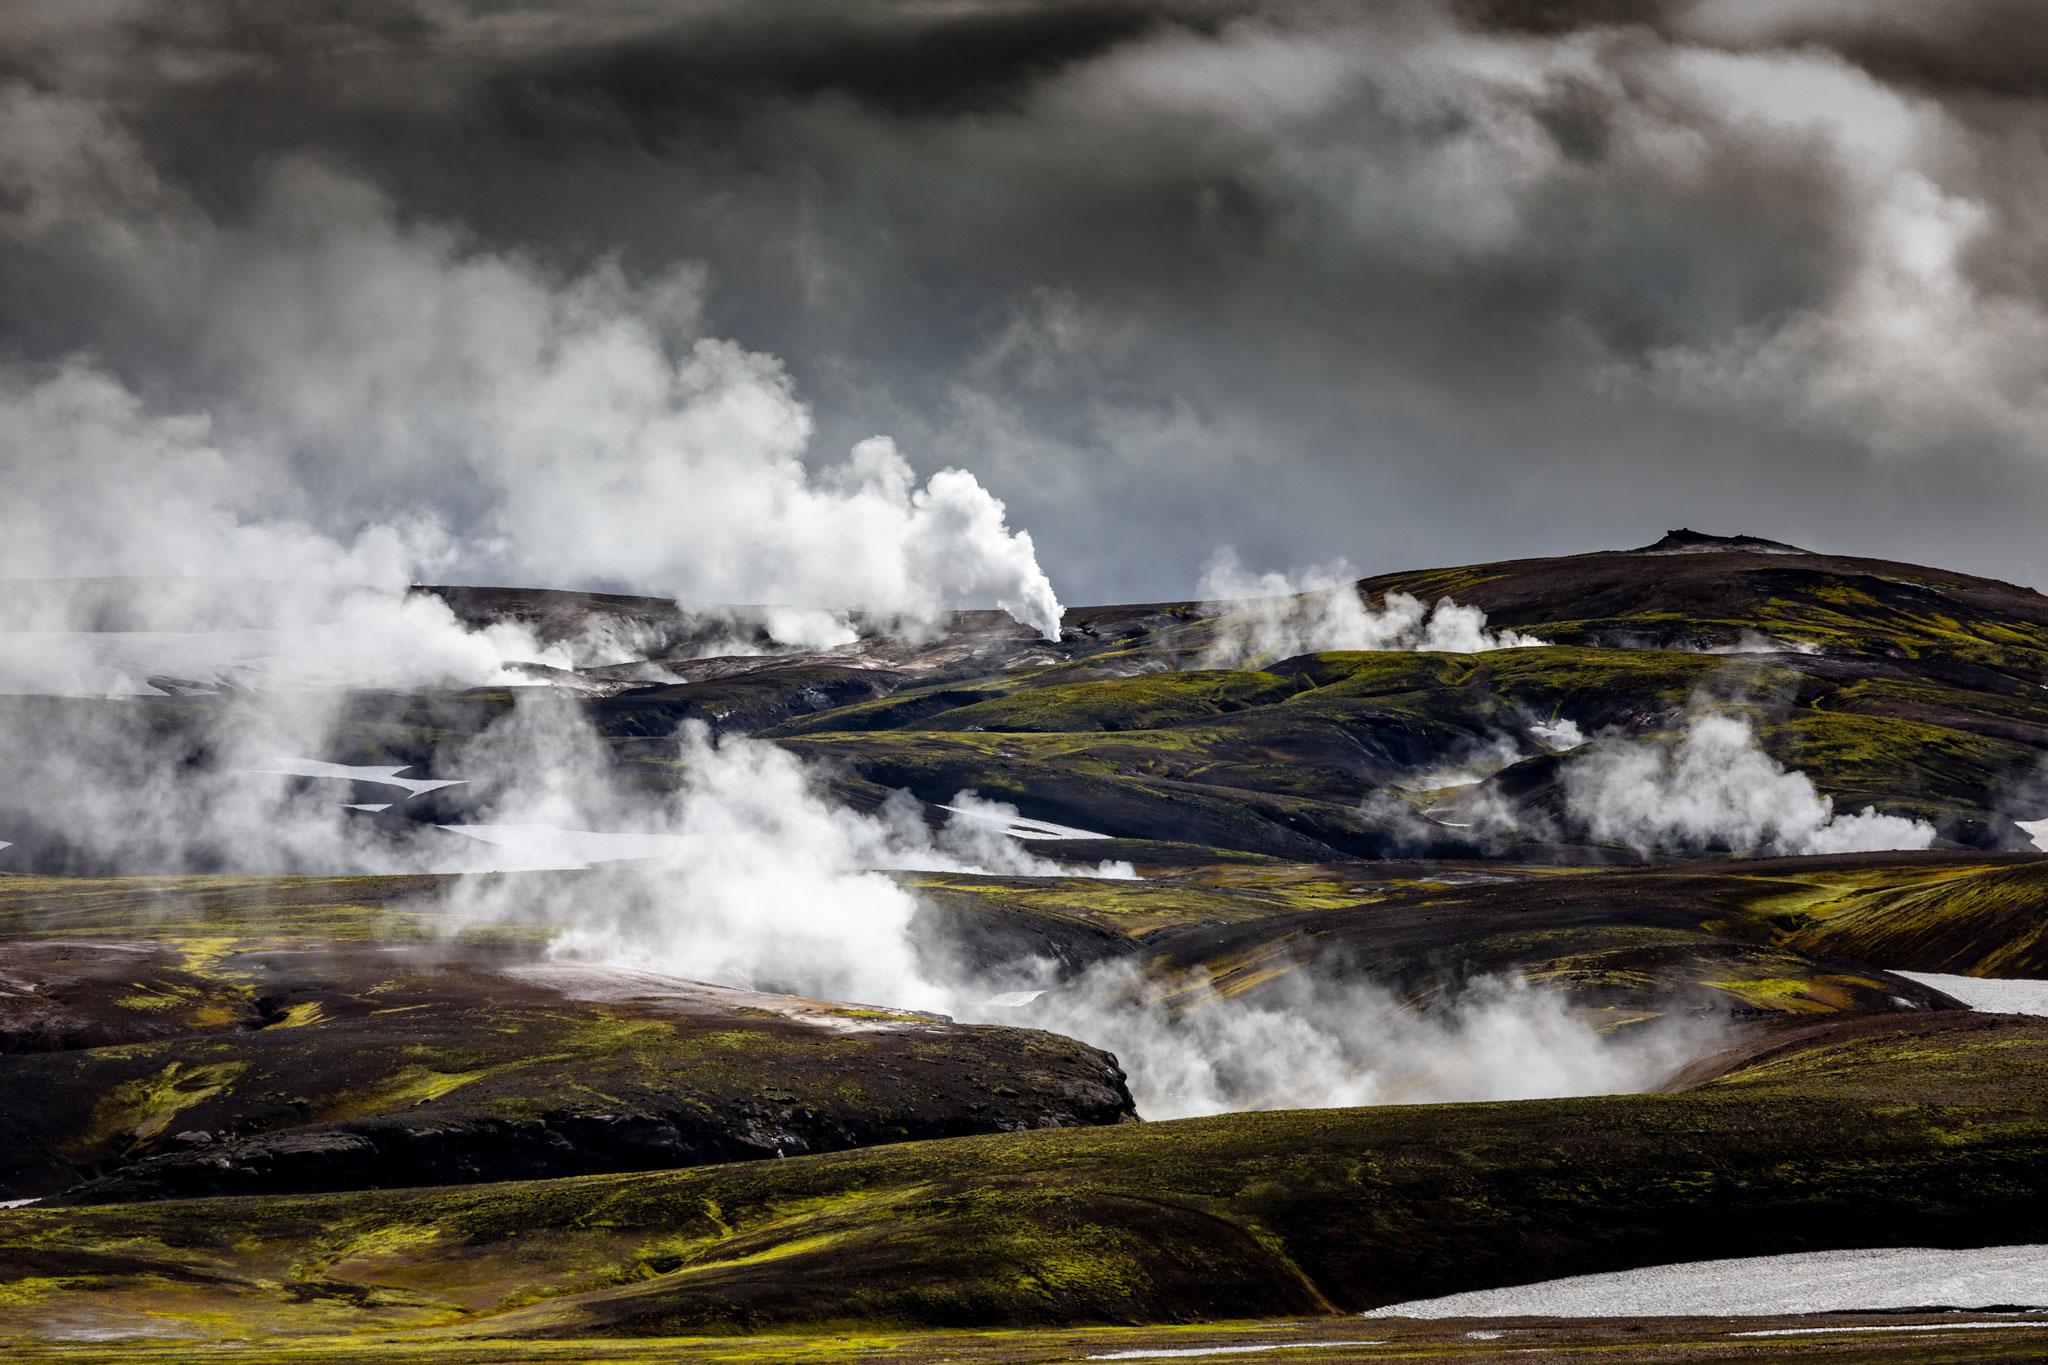 Landschaftsfotografie Peter Schreyer: Island